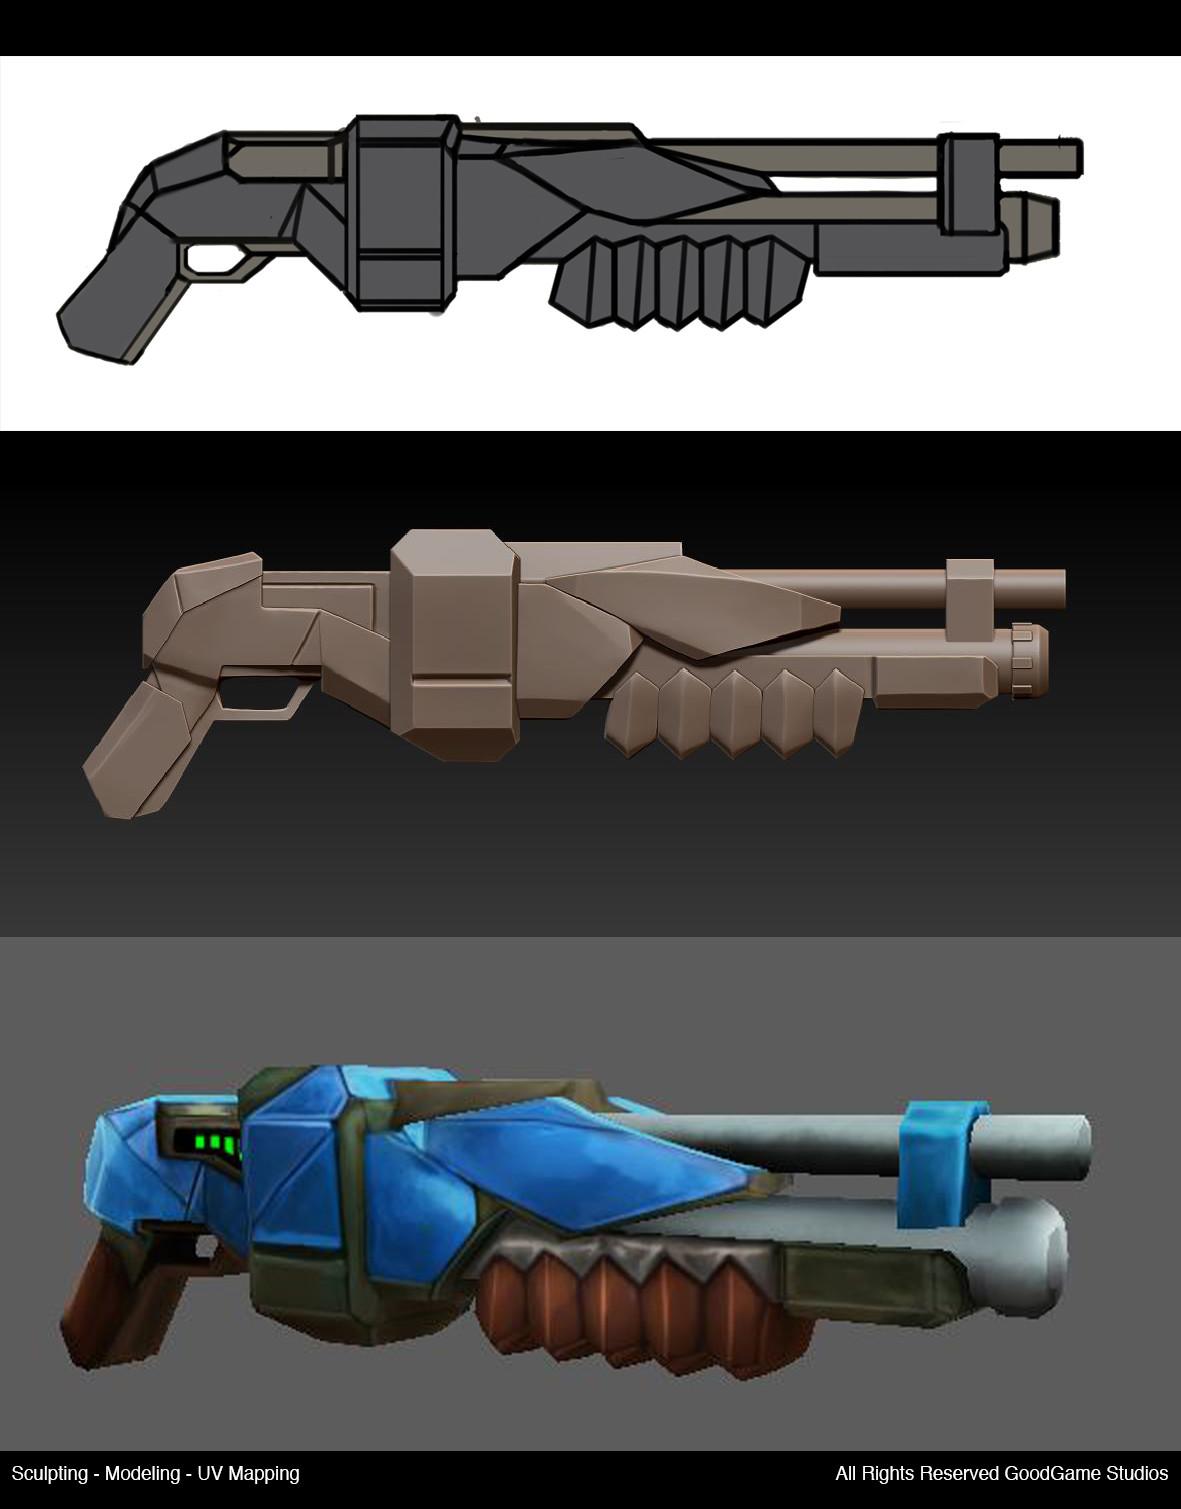 Ahmx merheb shotgun01